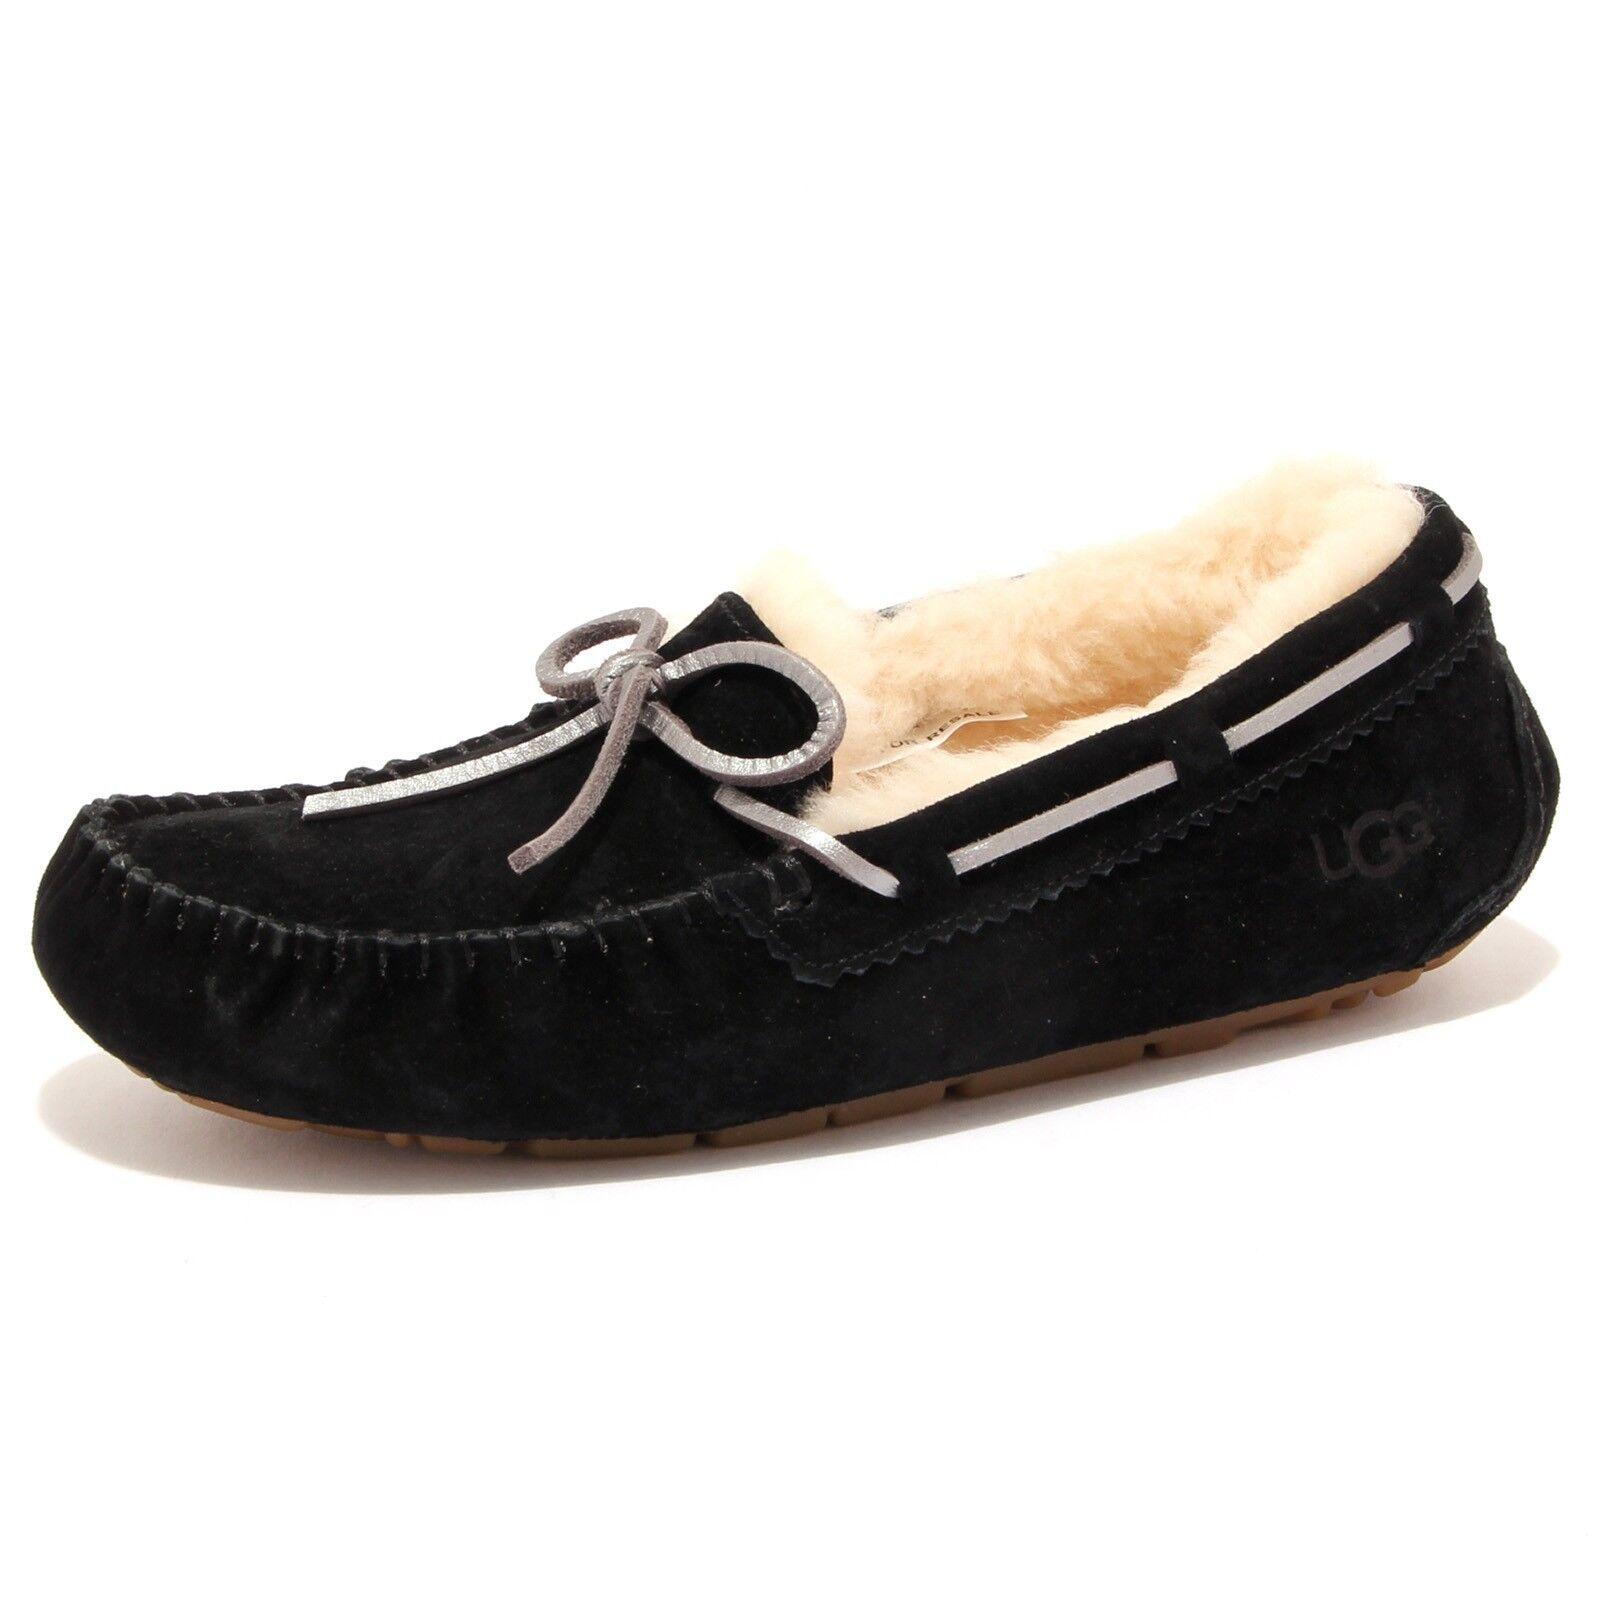 7601U (ECHANTILLON NON VENDU SANS BOÎTE) Chaussures UGG mocassino donna